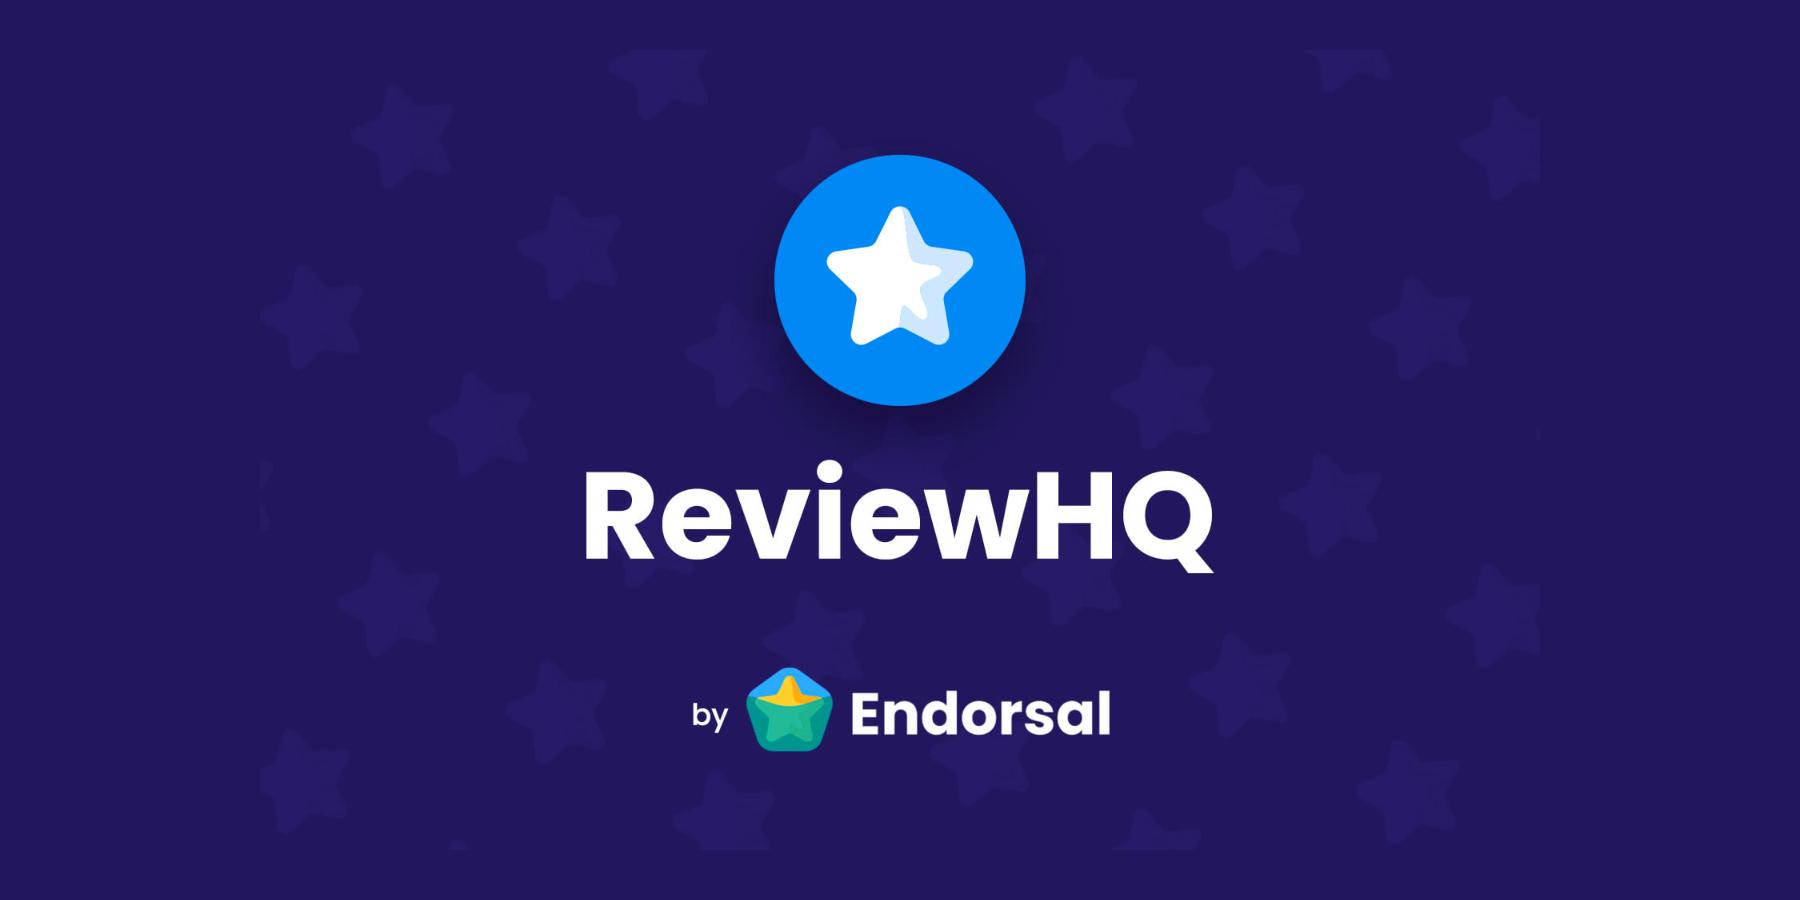 ReviewHQ